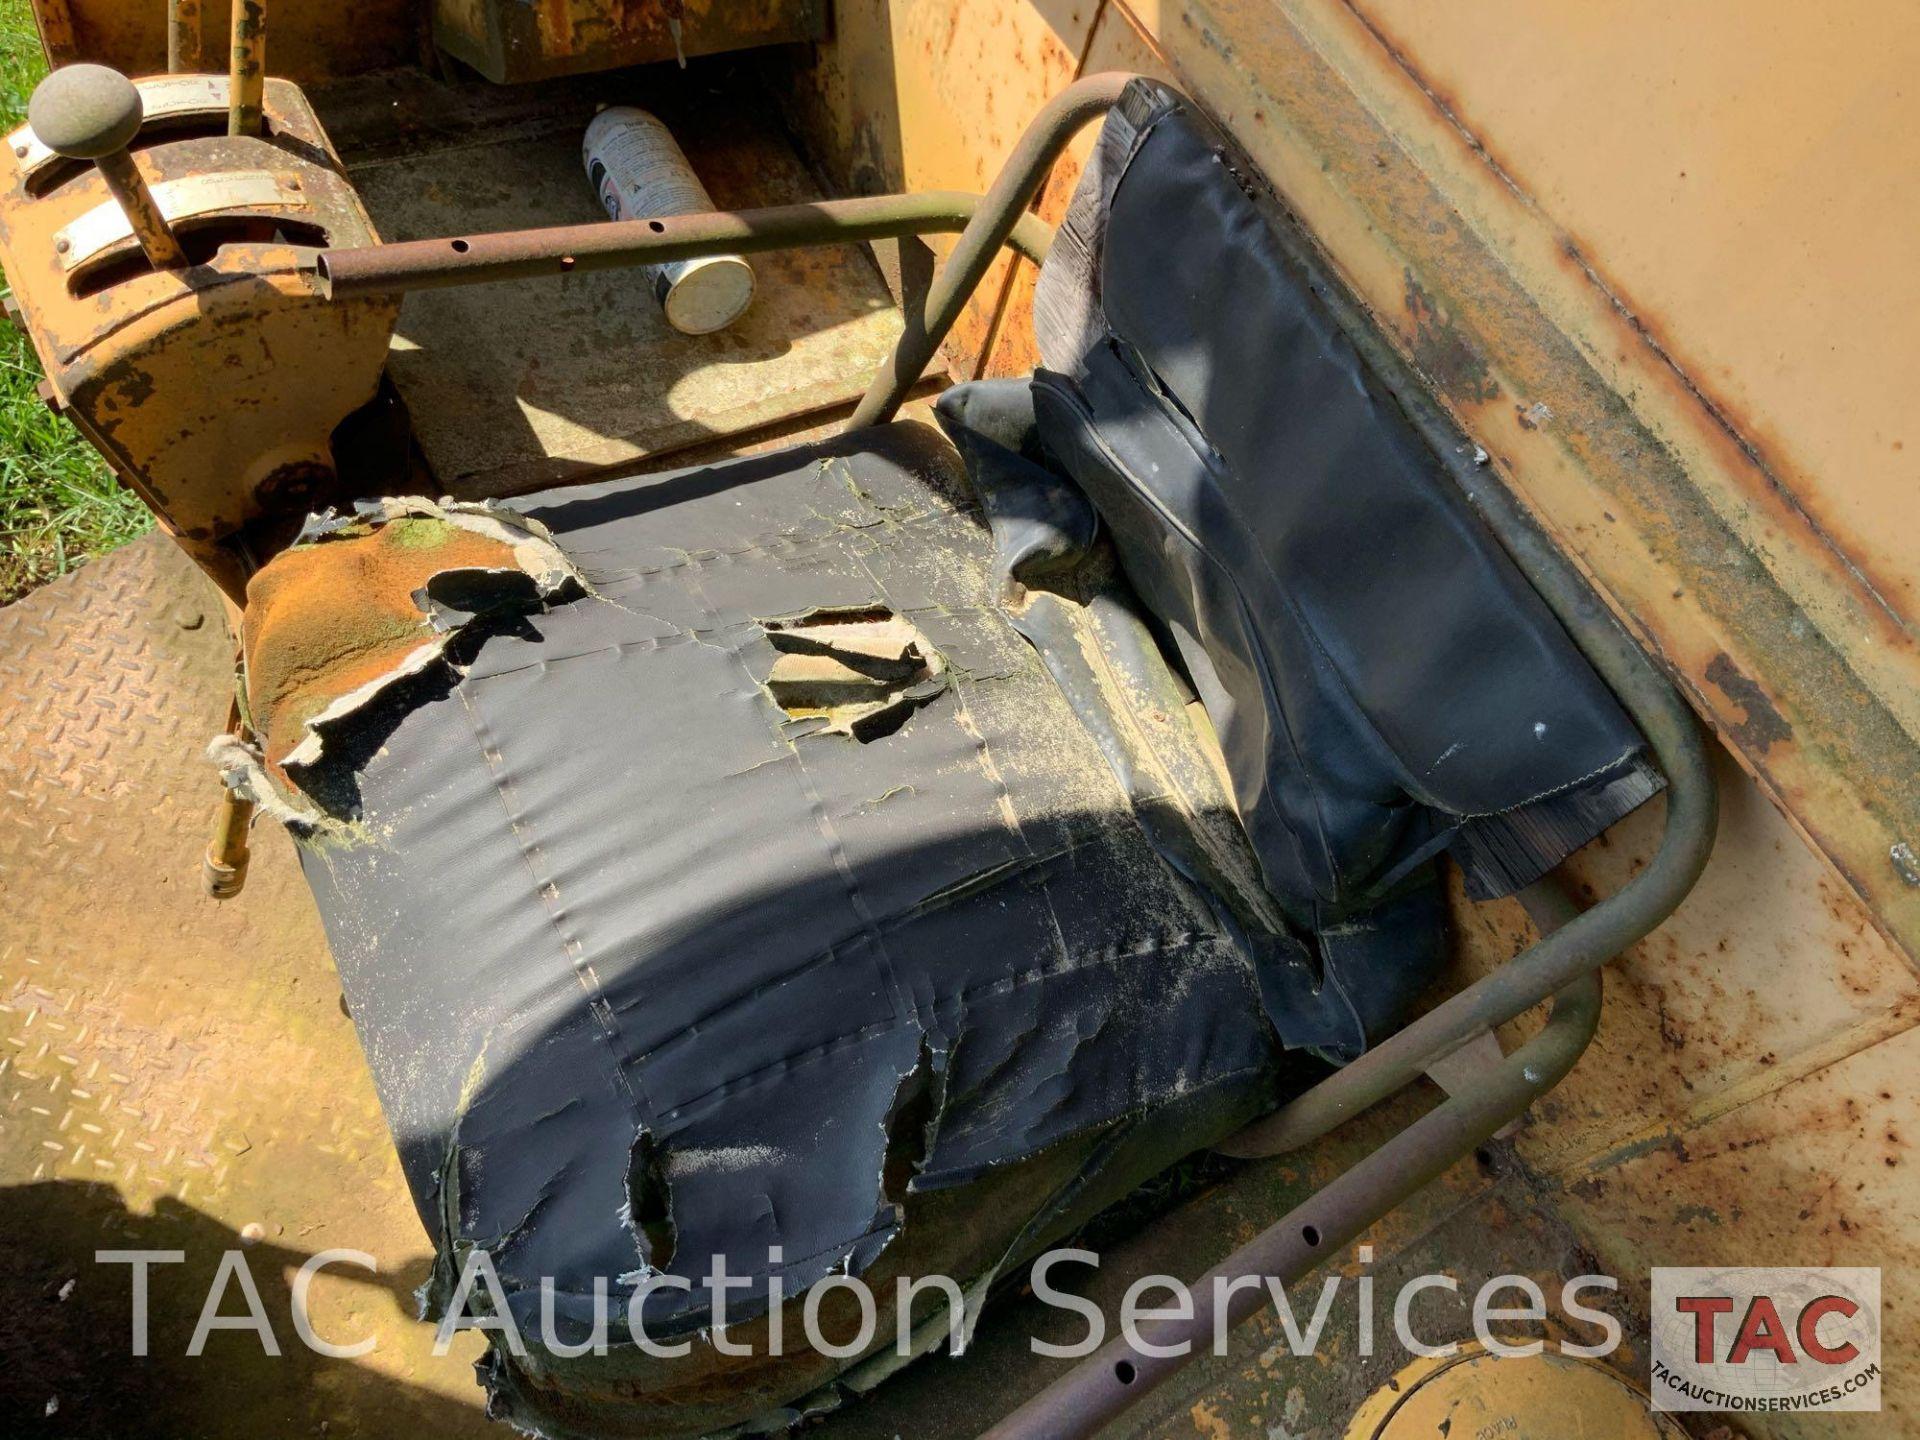 Galion T-500L Motor Grader - Image 22 of 28